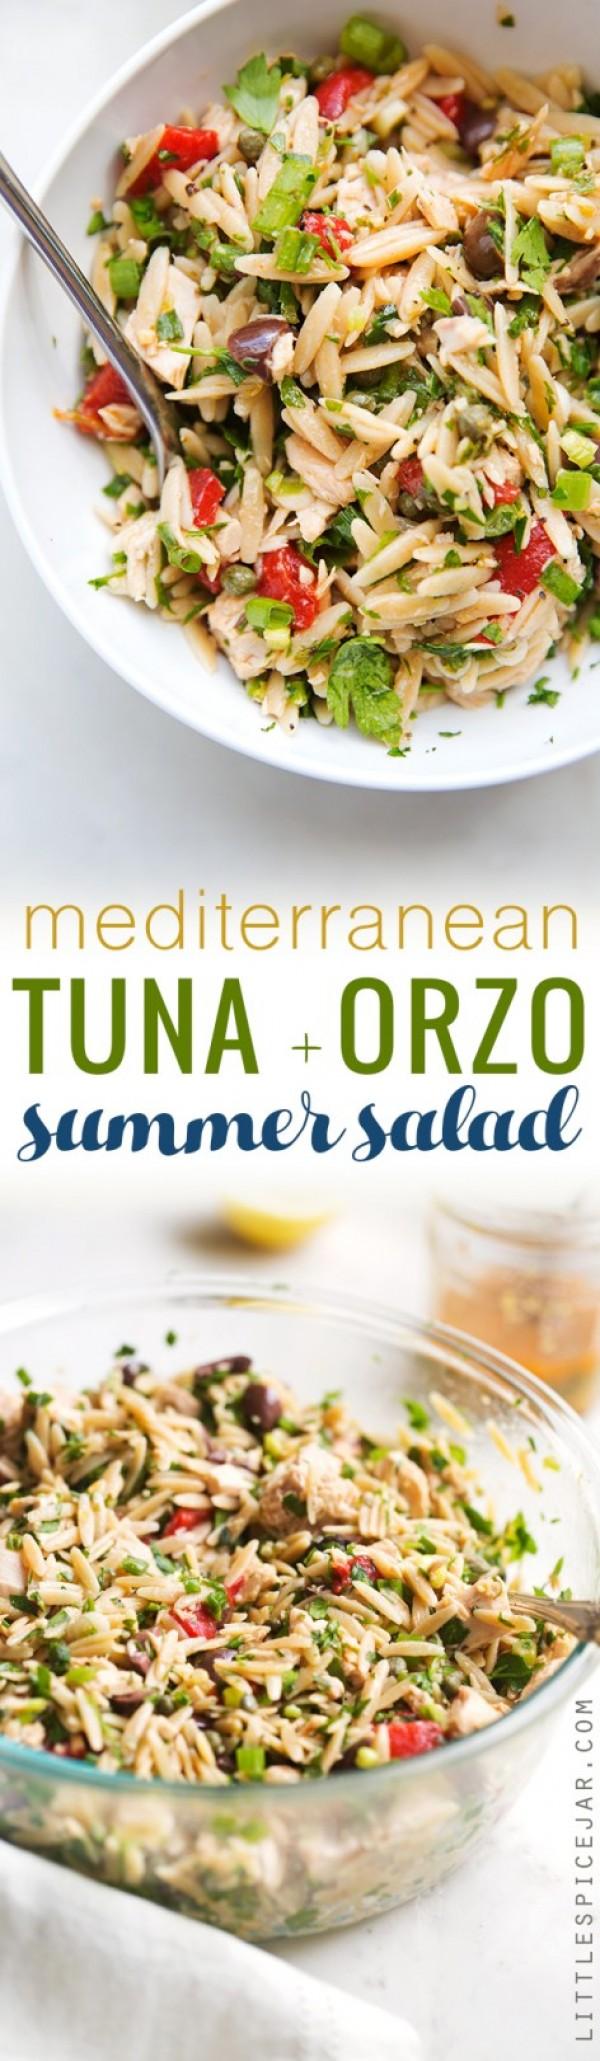 Get the recipe Mediterranean Tuna Orzo Summer Salad @recipes_to_go